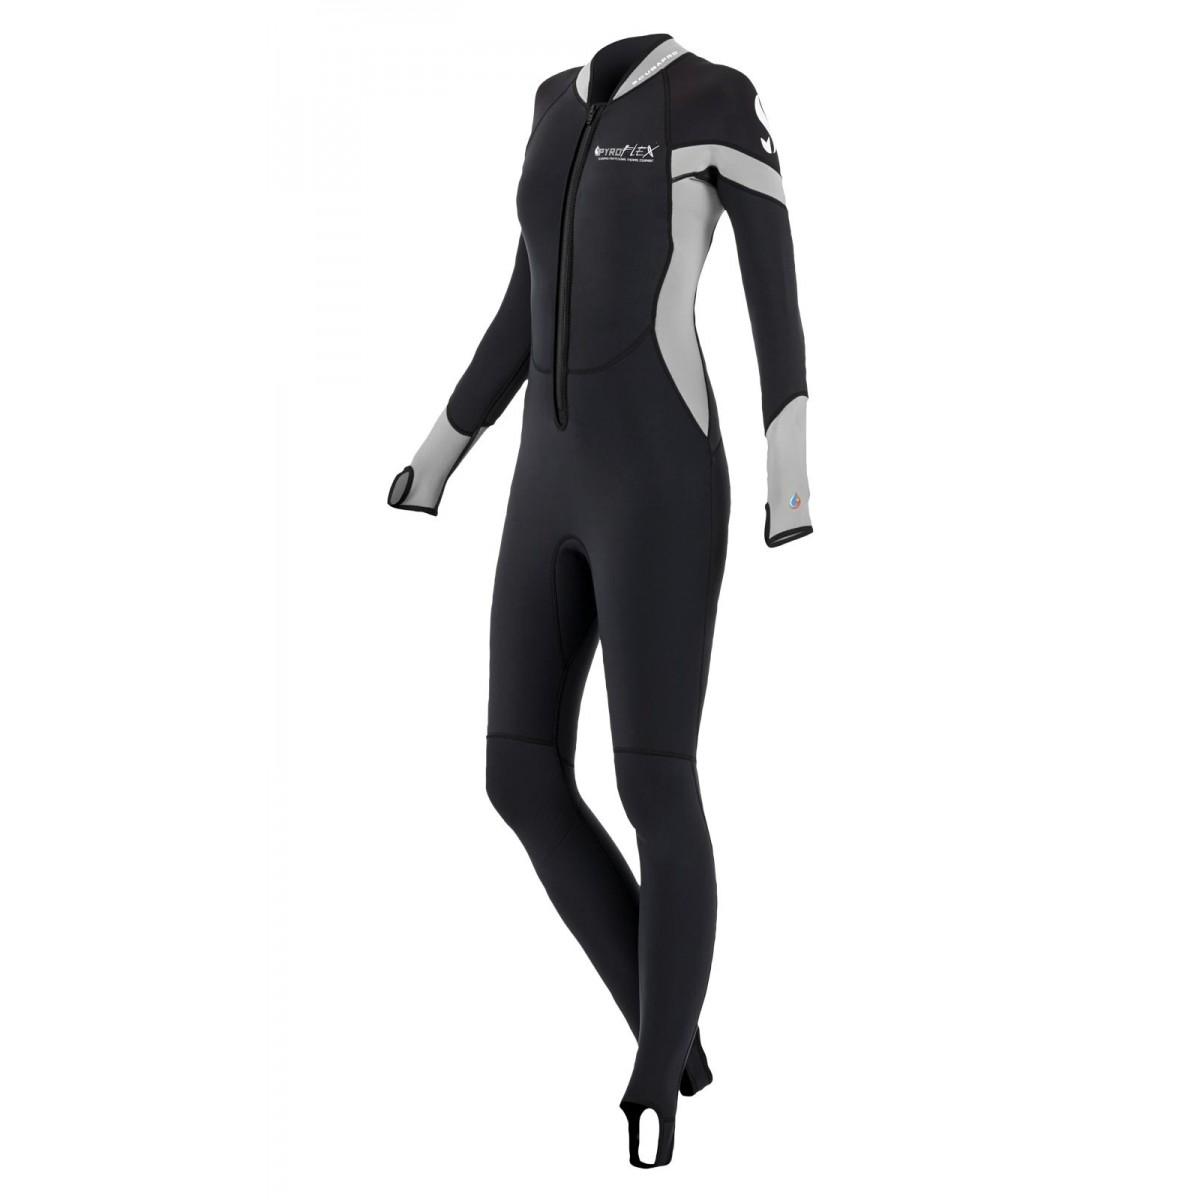 Scubapro Women's Pyroflex 1.5MM Steamer Wetsuit